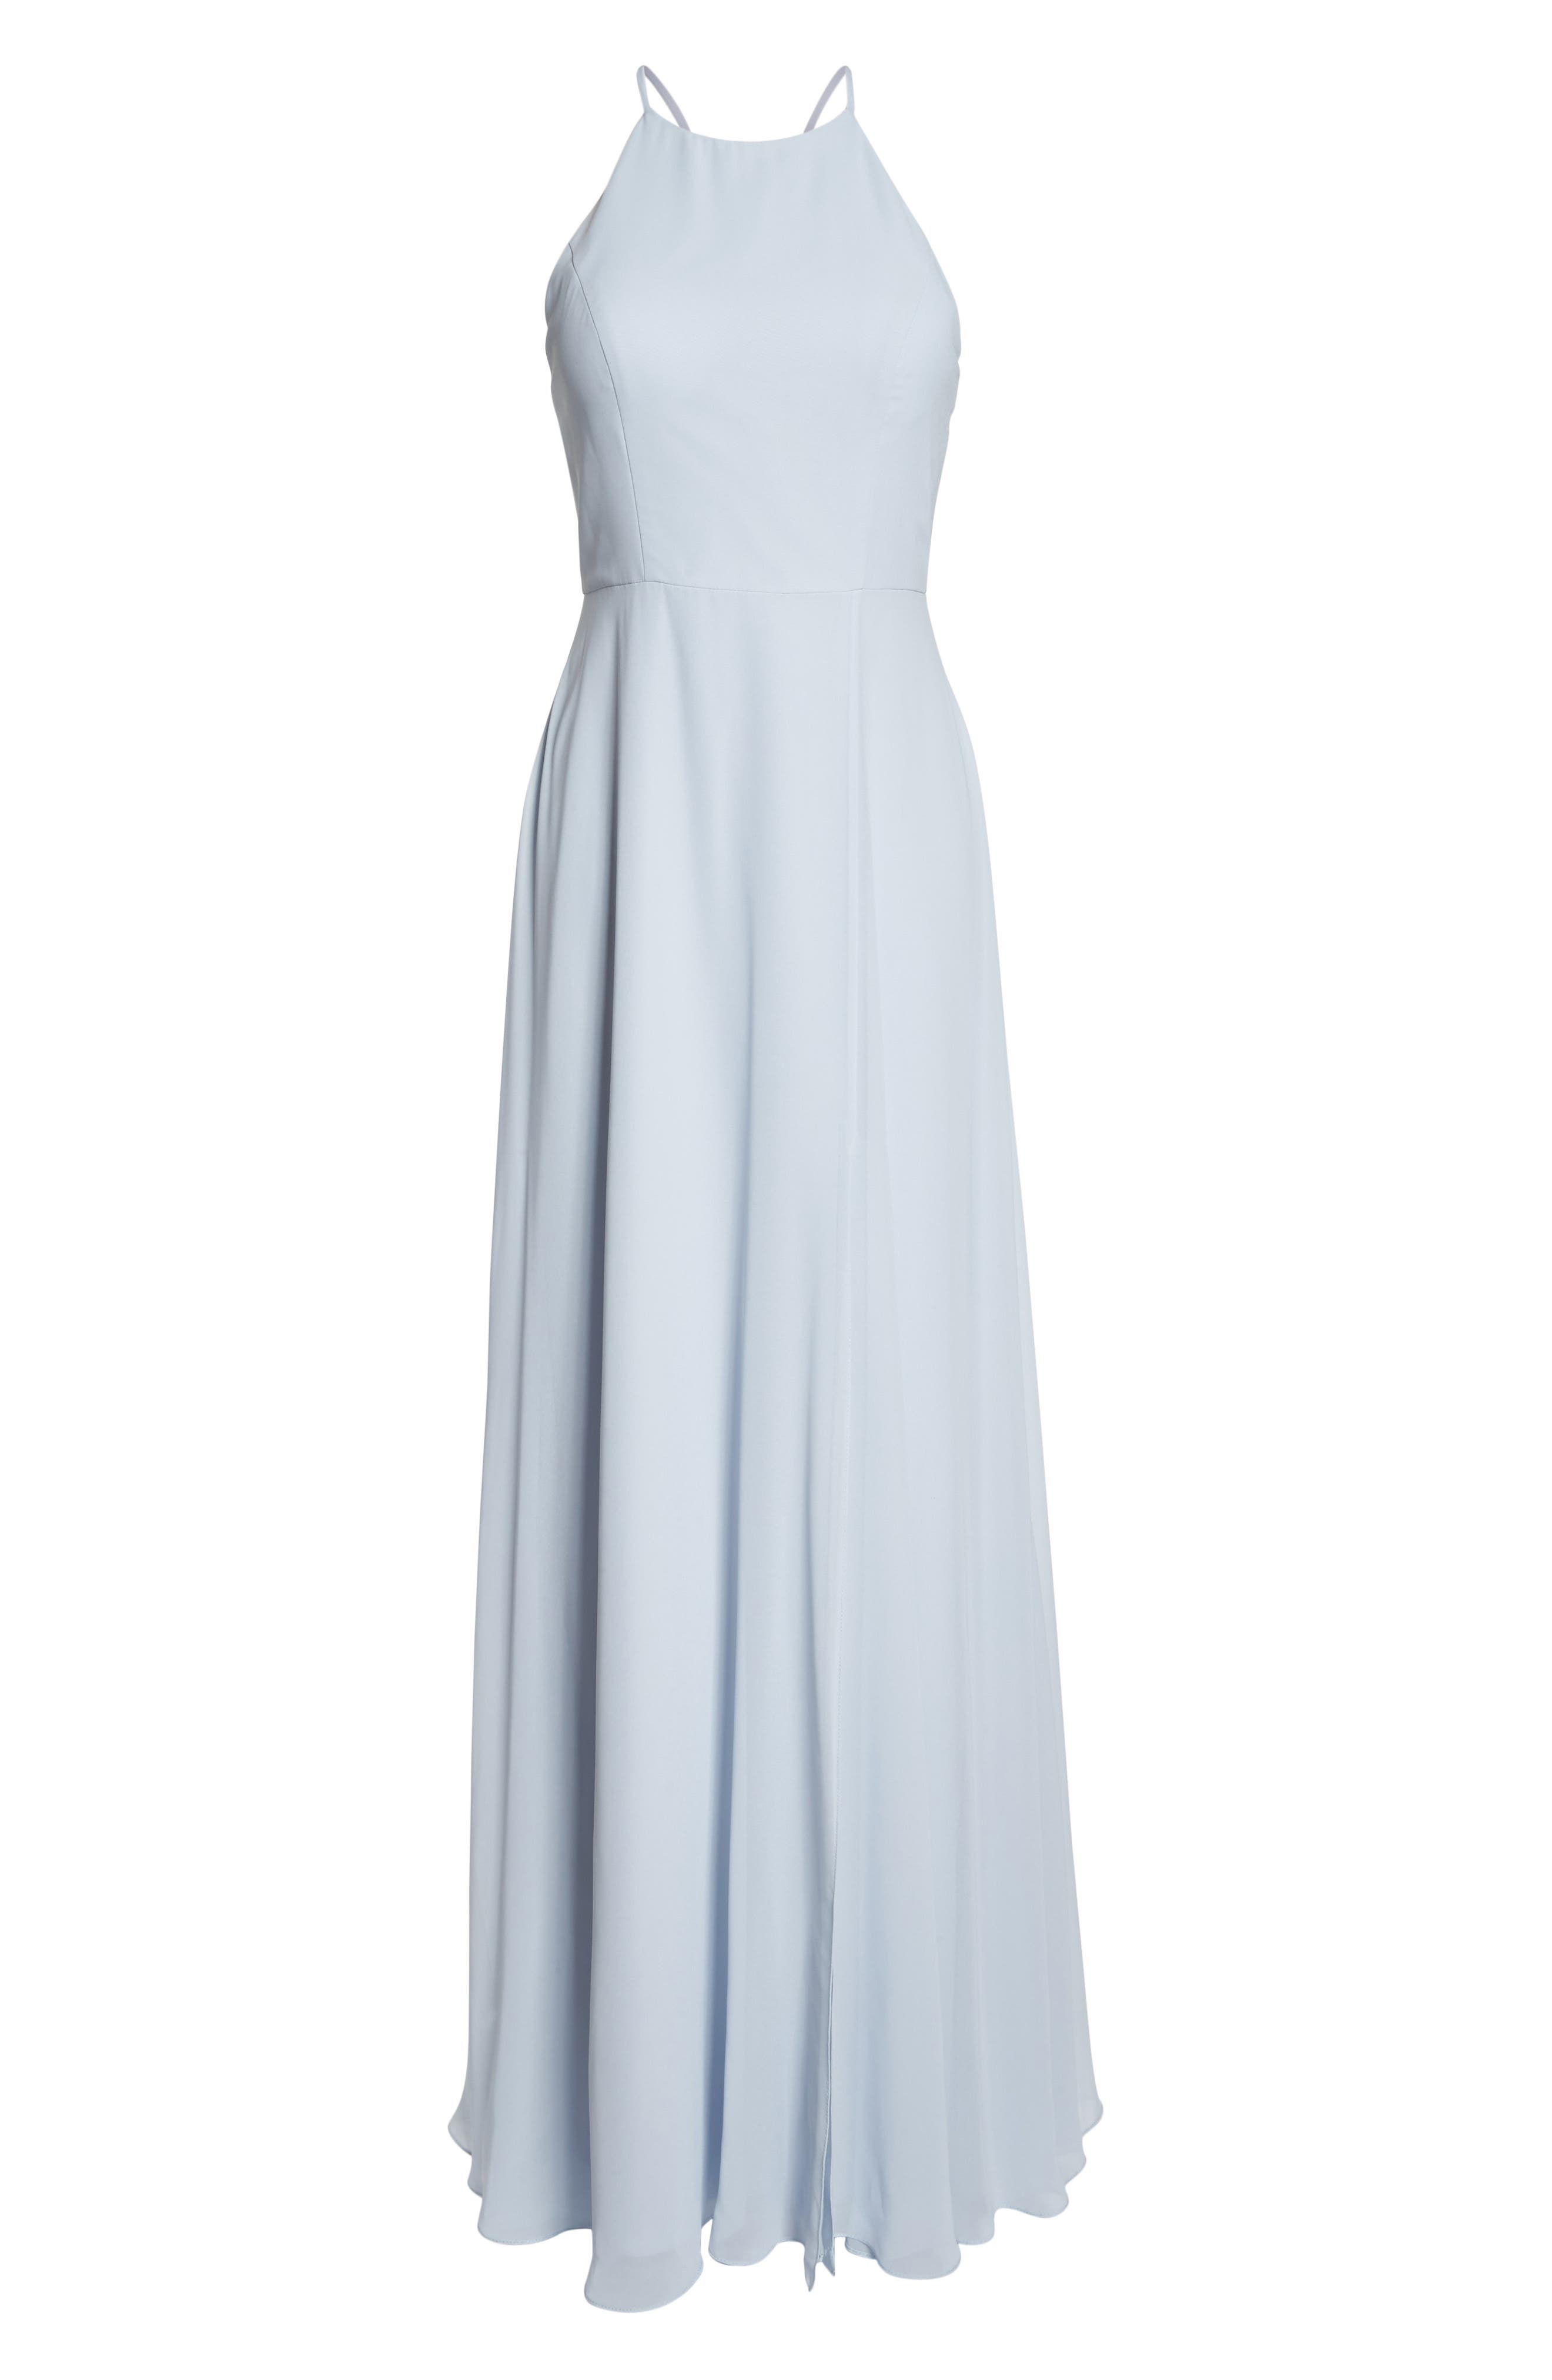 JENNY YOO, Kayla A-Line Halter Gown, Alternate thumbnail 8, color, WHISPER BLUE